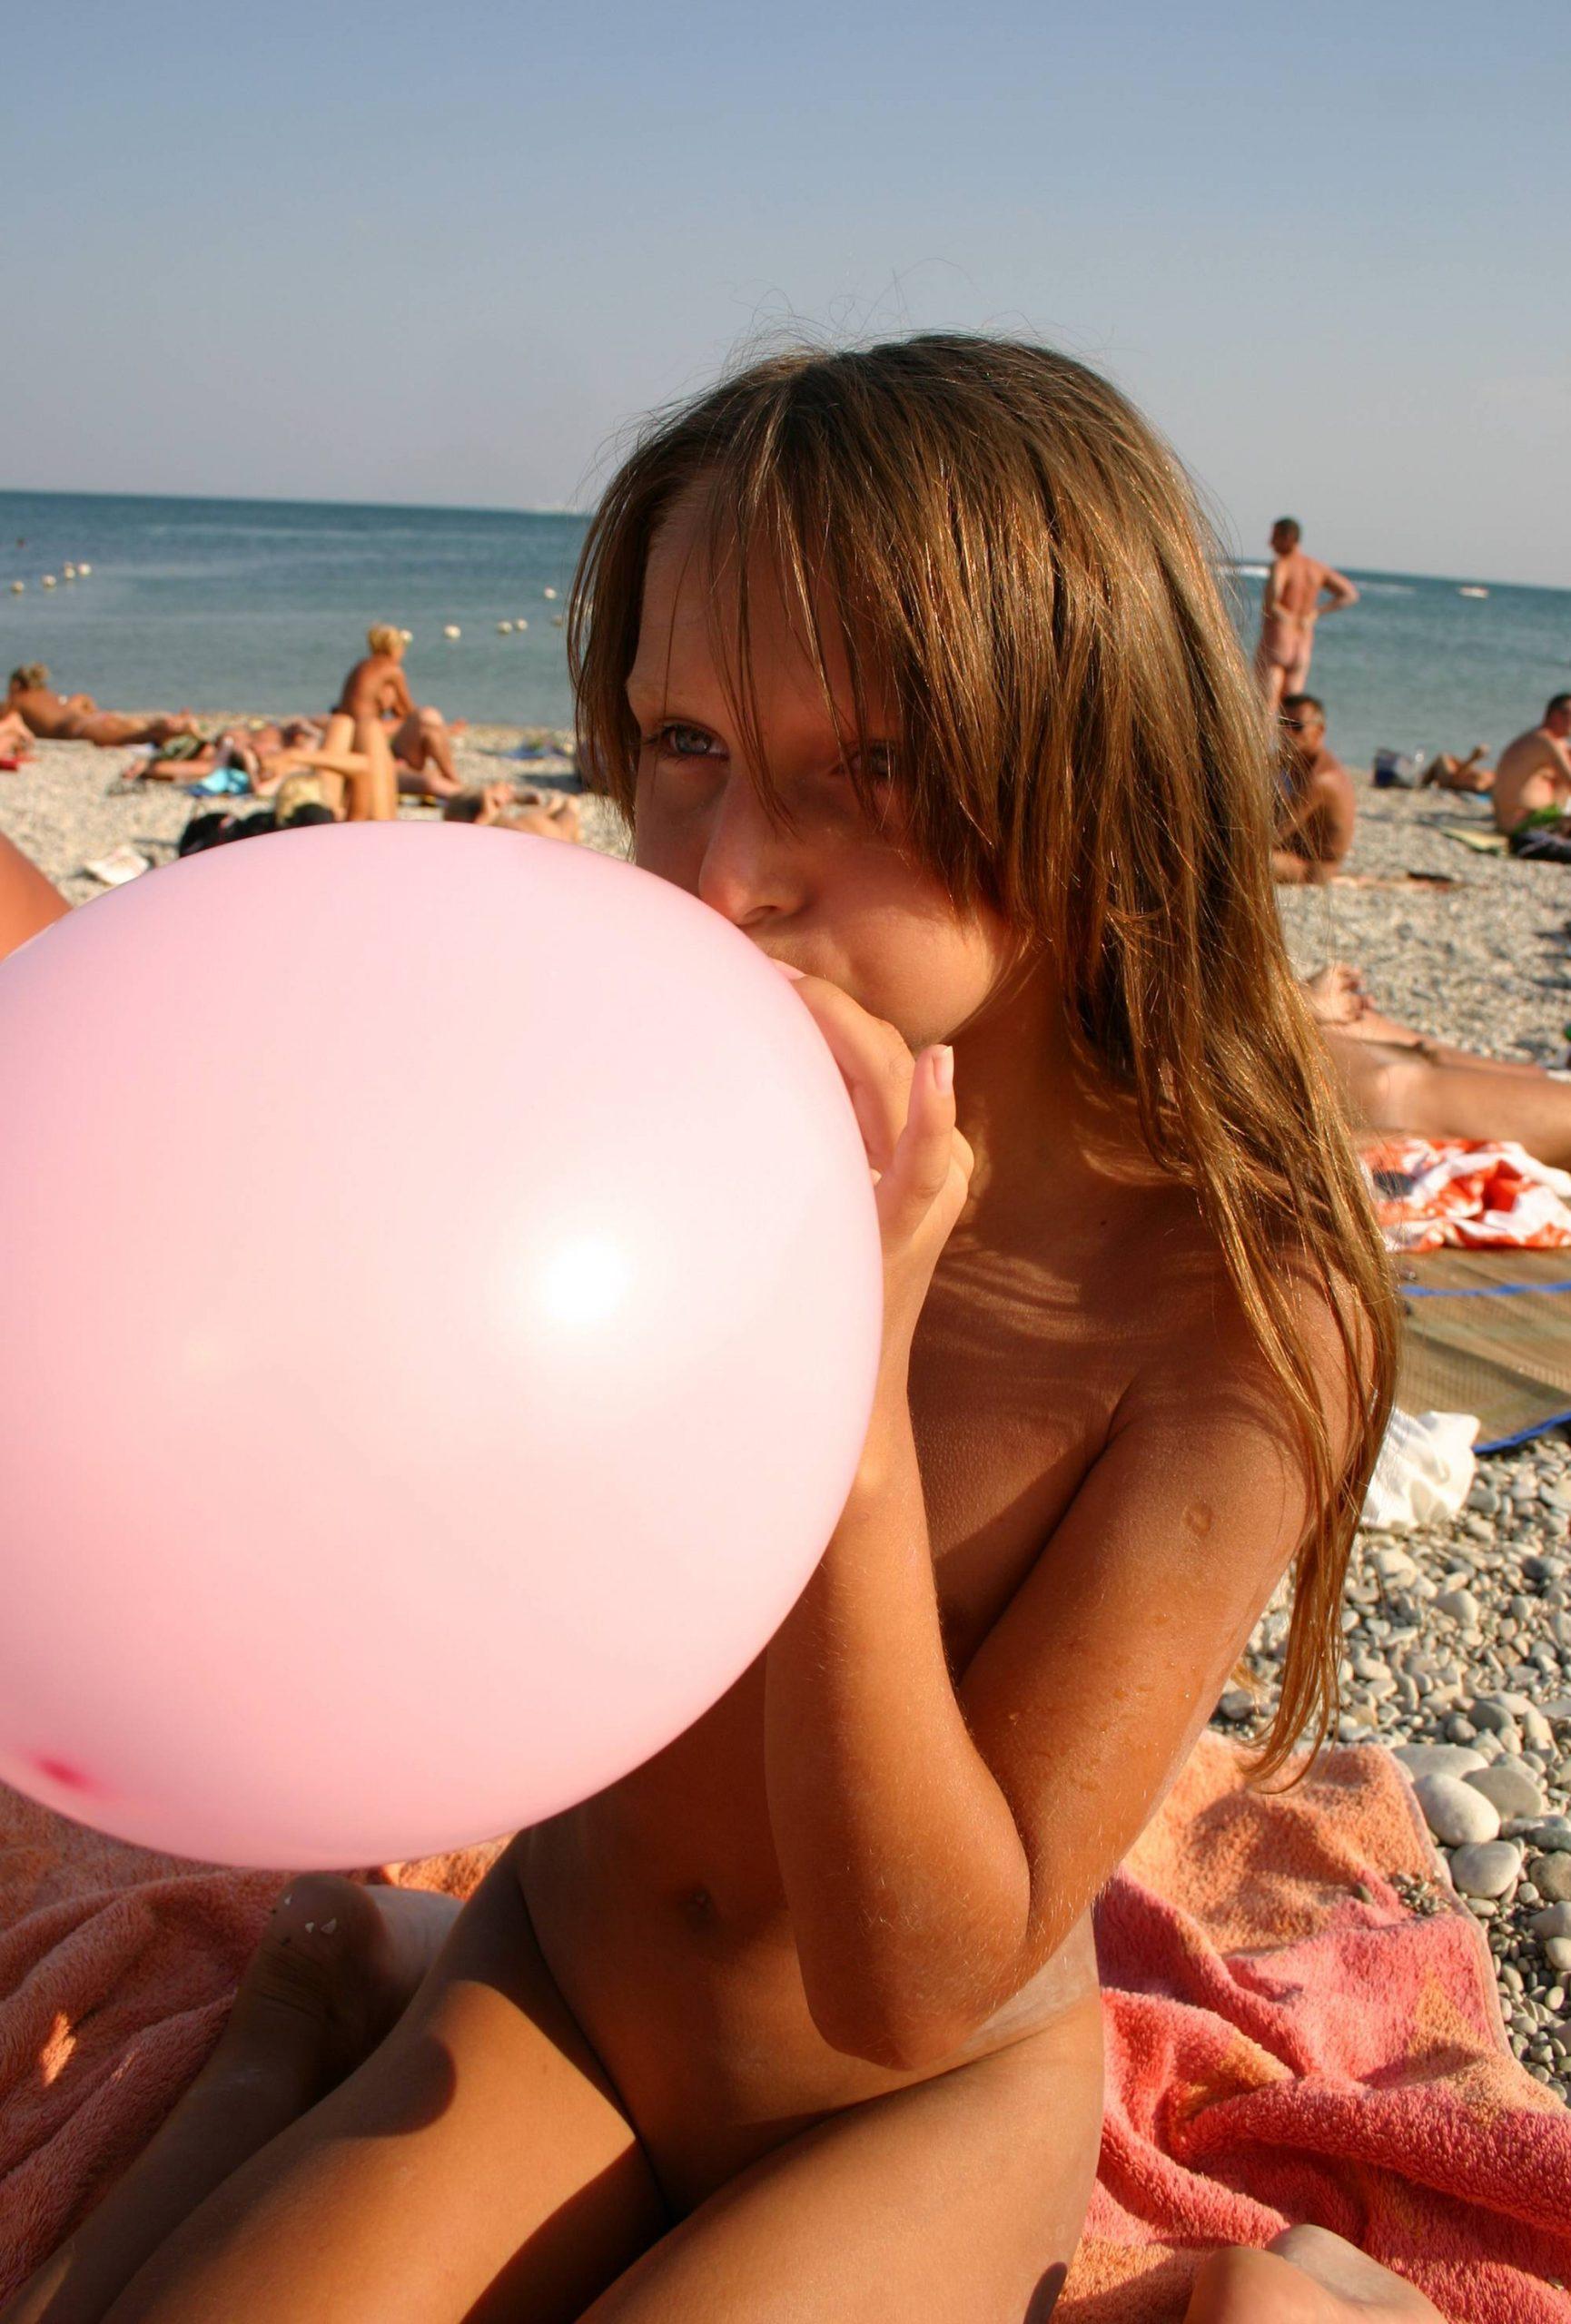 Our Beach Balloon Profile - 2